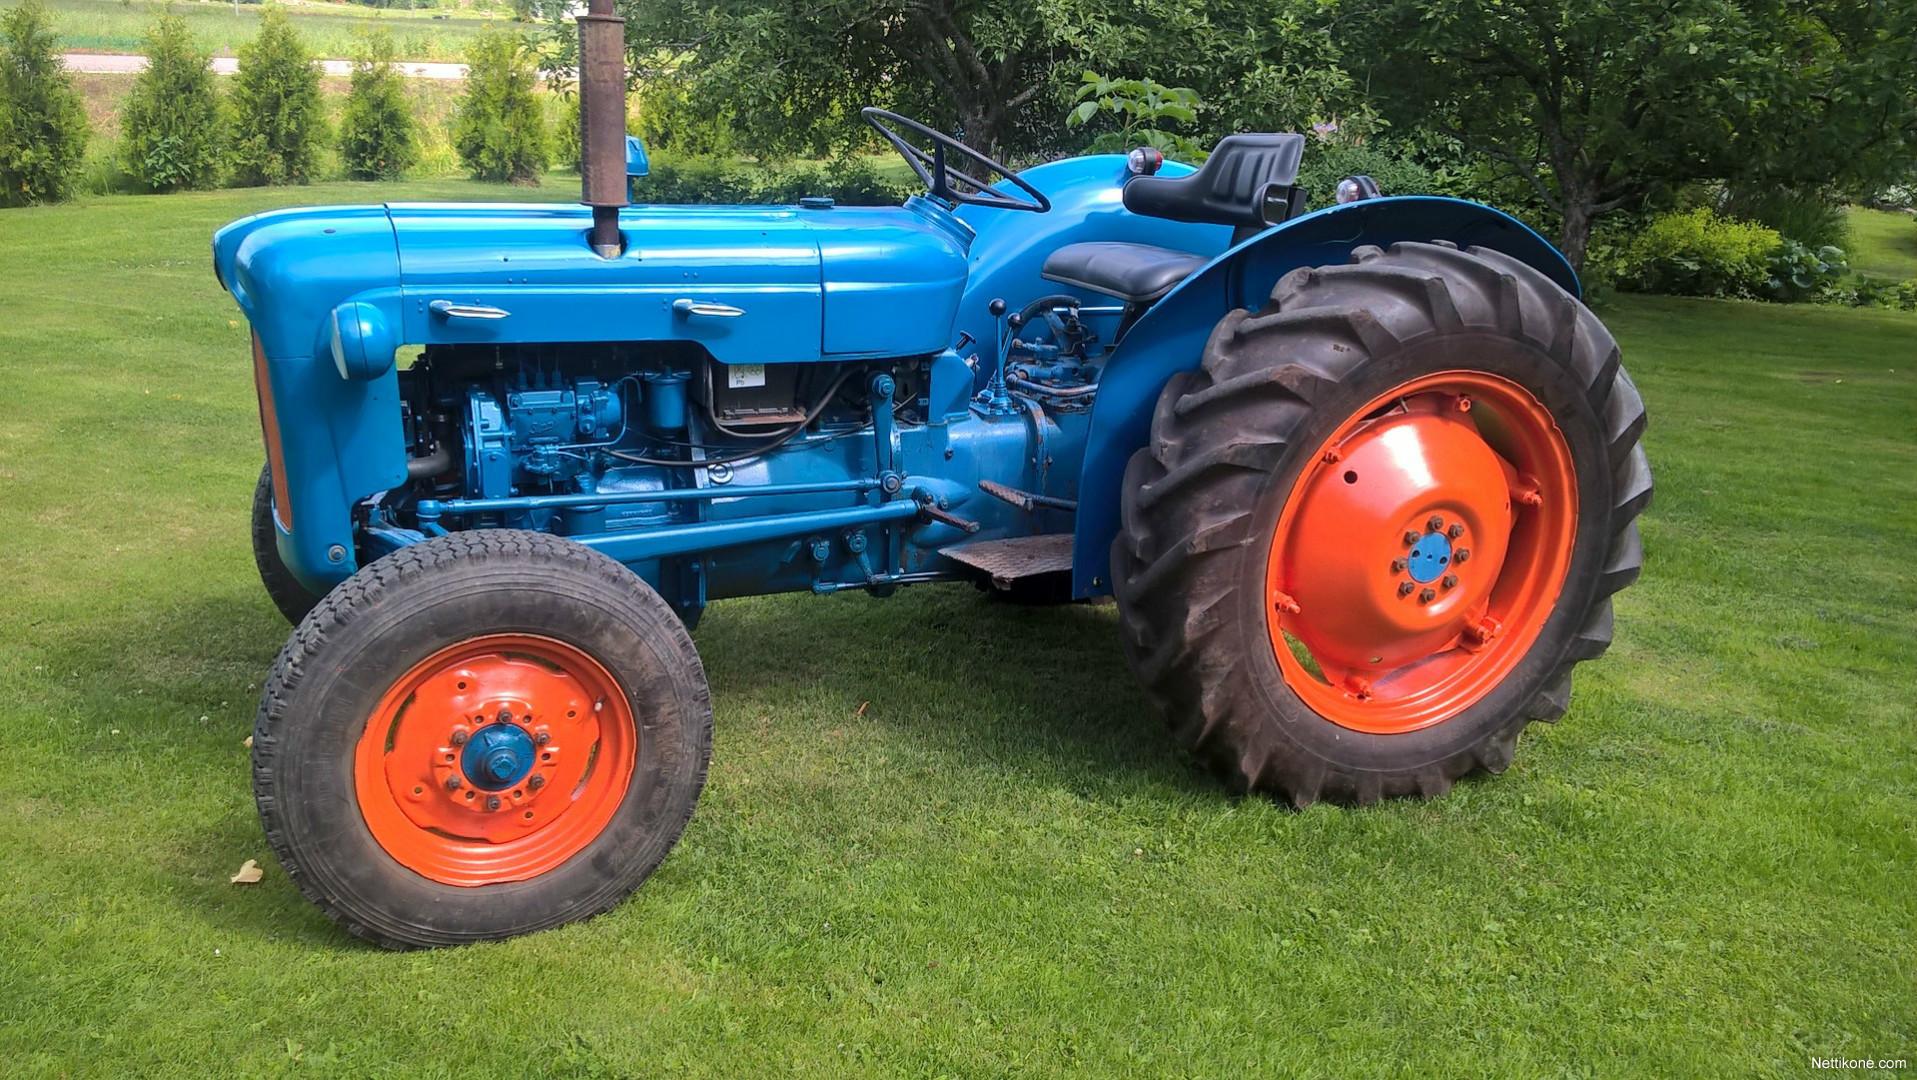 1961 Fordson Dexta Tractor : Fordson dexta tractors nettikone